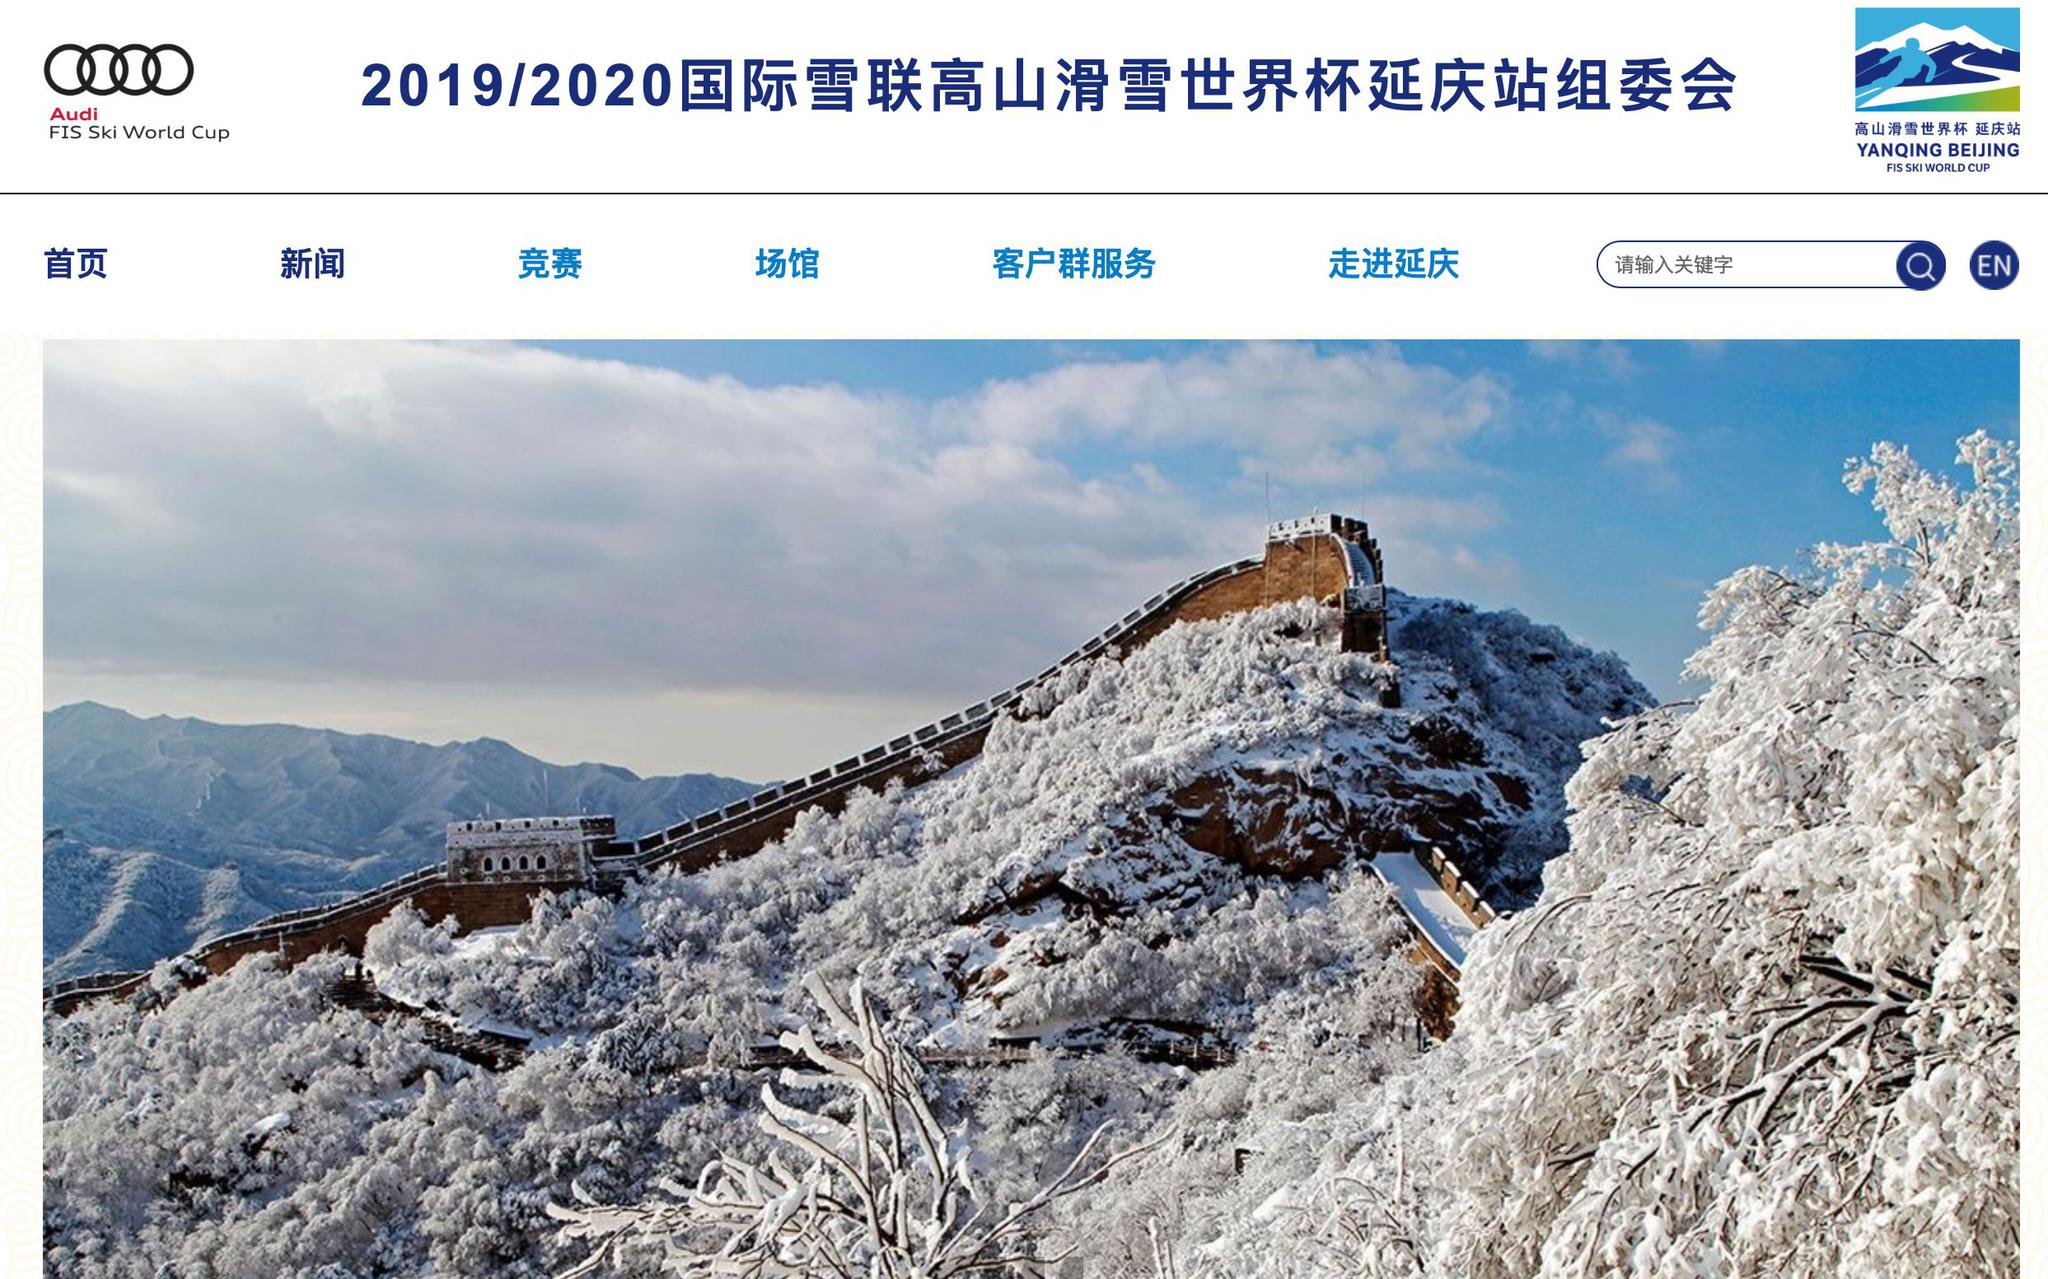 http://www.bjgjt.com/caijingfenxi/82281.html